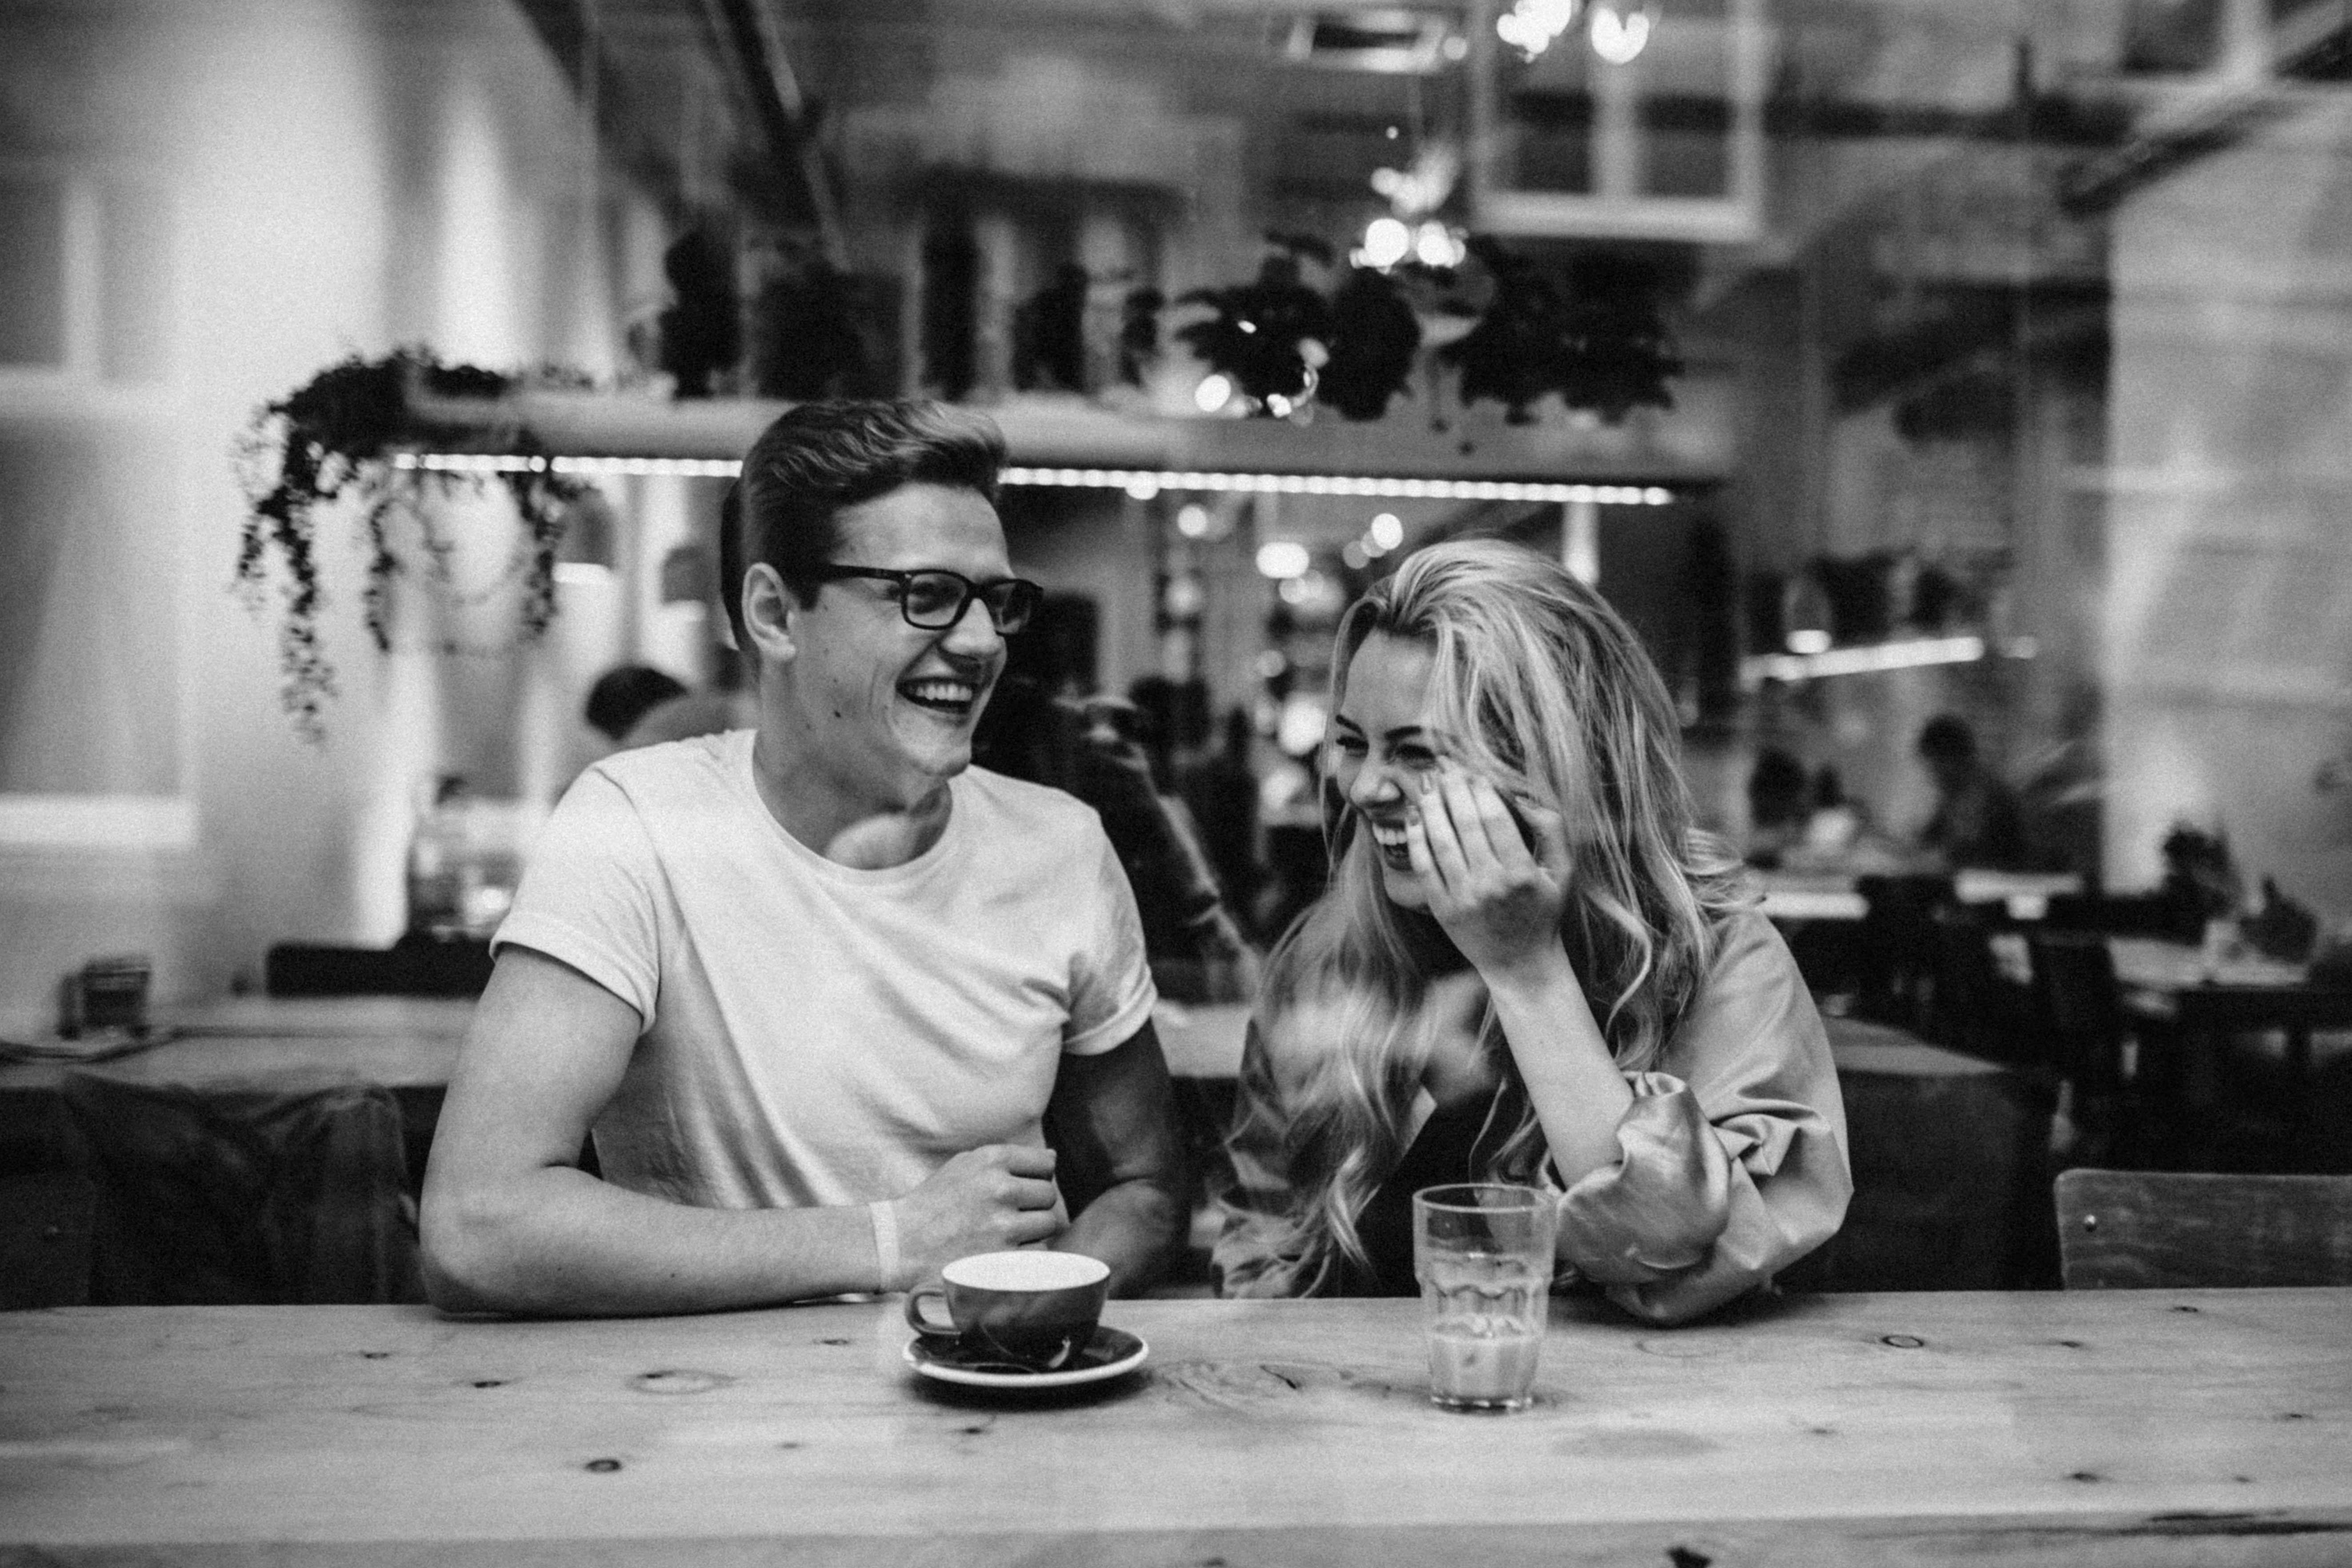 Liebespaar Maastricht Sonja Pöhlmann Photography Couples München Bayern